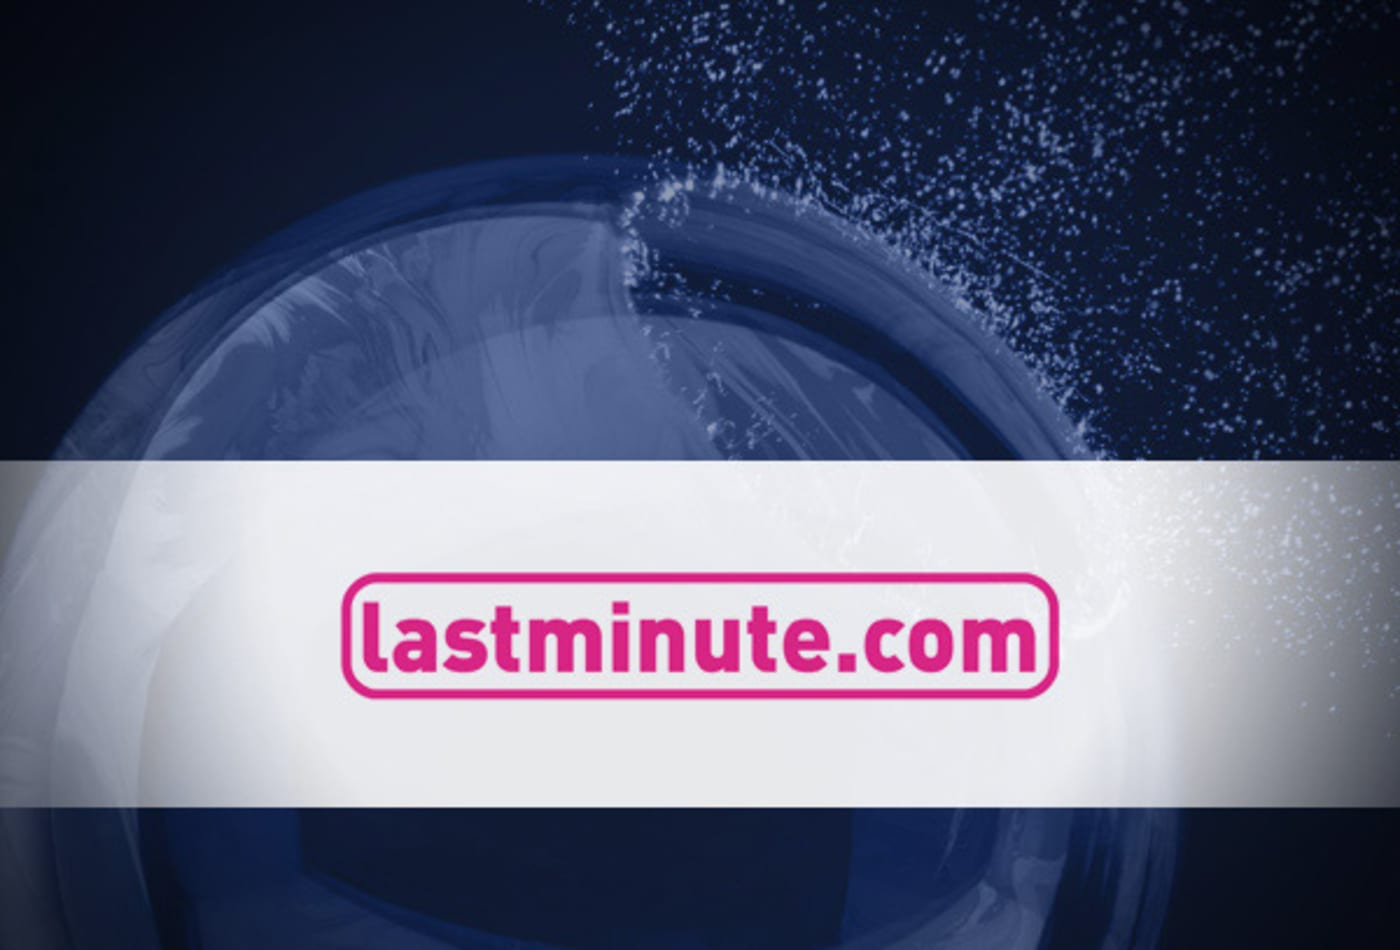 dotcom-busts-last-minute-com.jpg